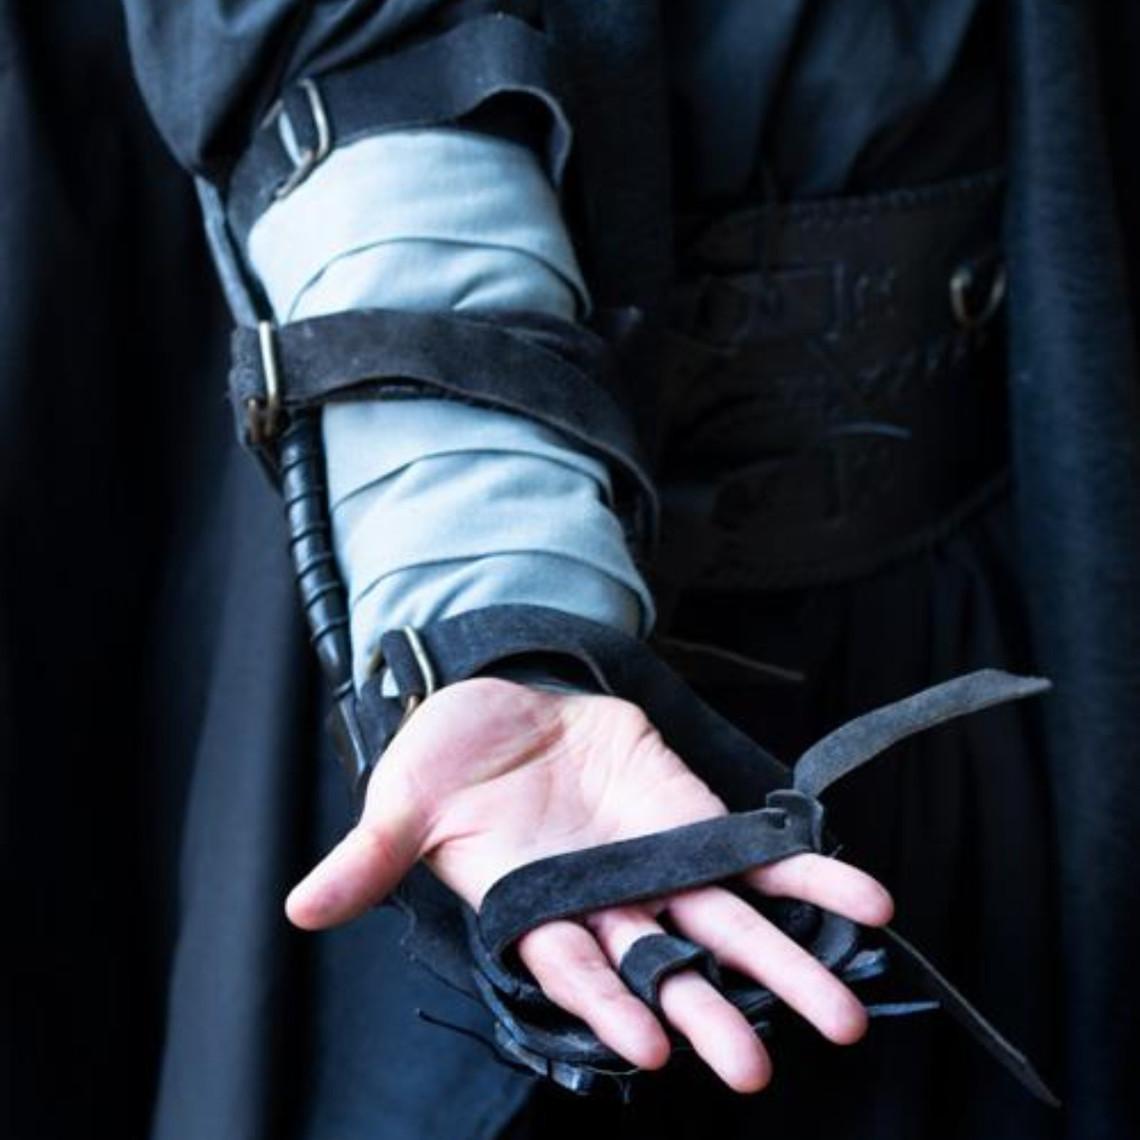 Epic Armoury Armschiene Klaue, rechte Hand